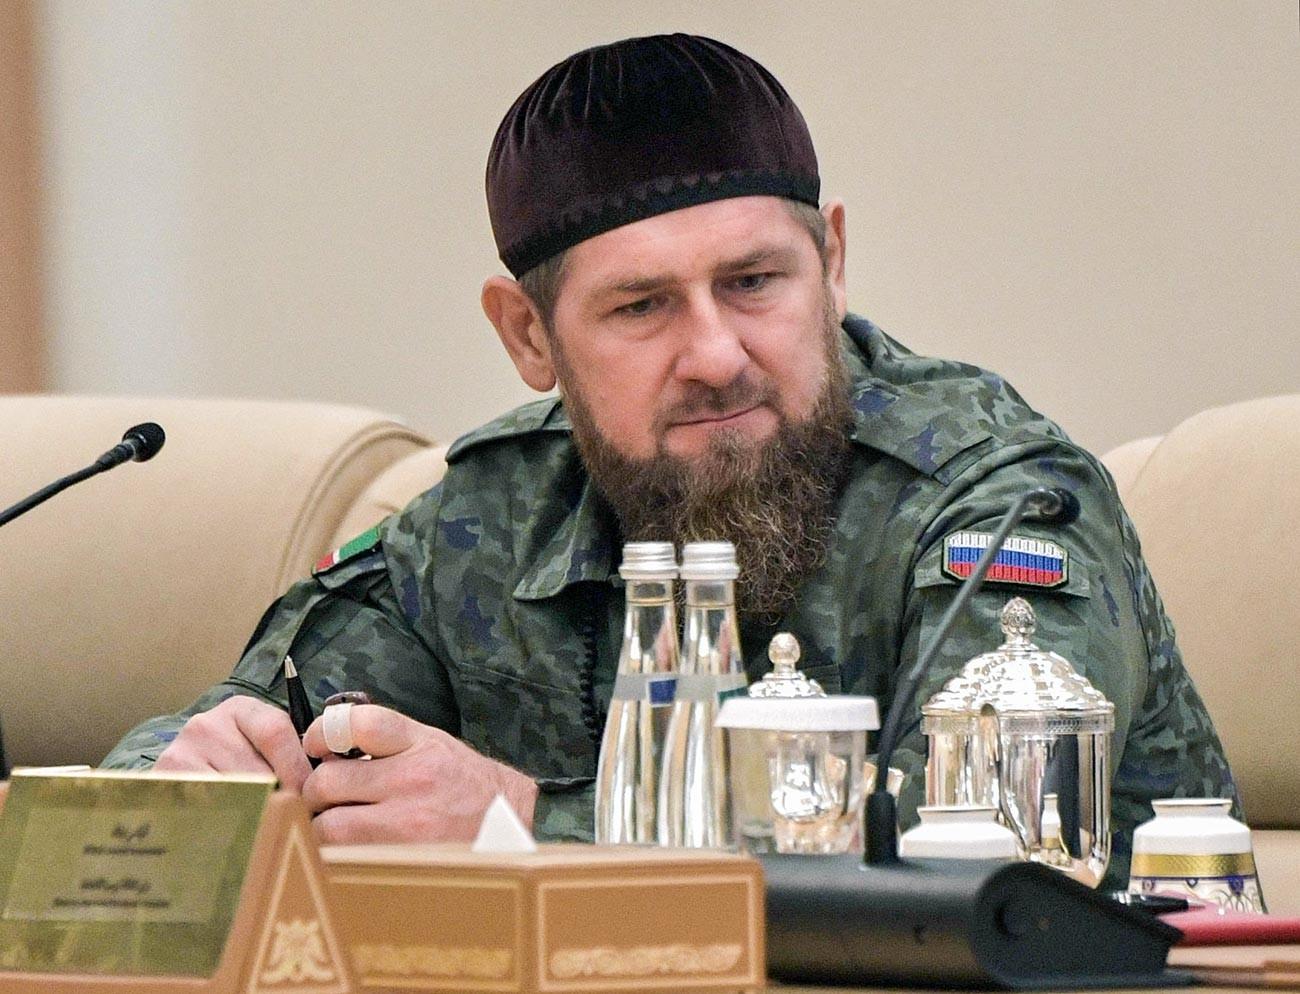 Jefe de la República de Chechenia, Ramzan Kadyrov.